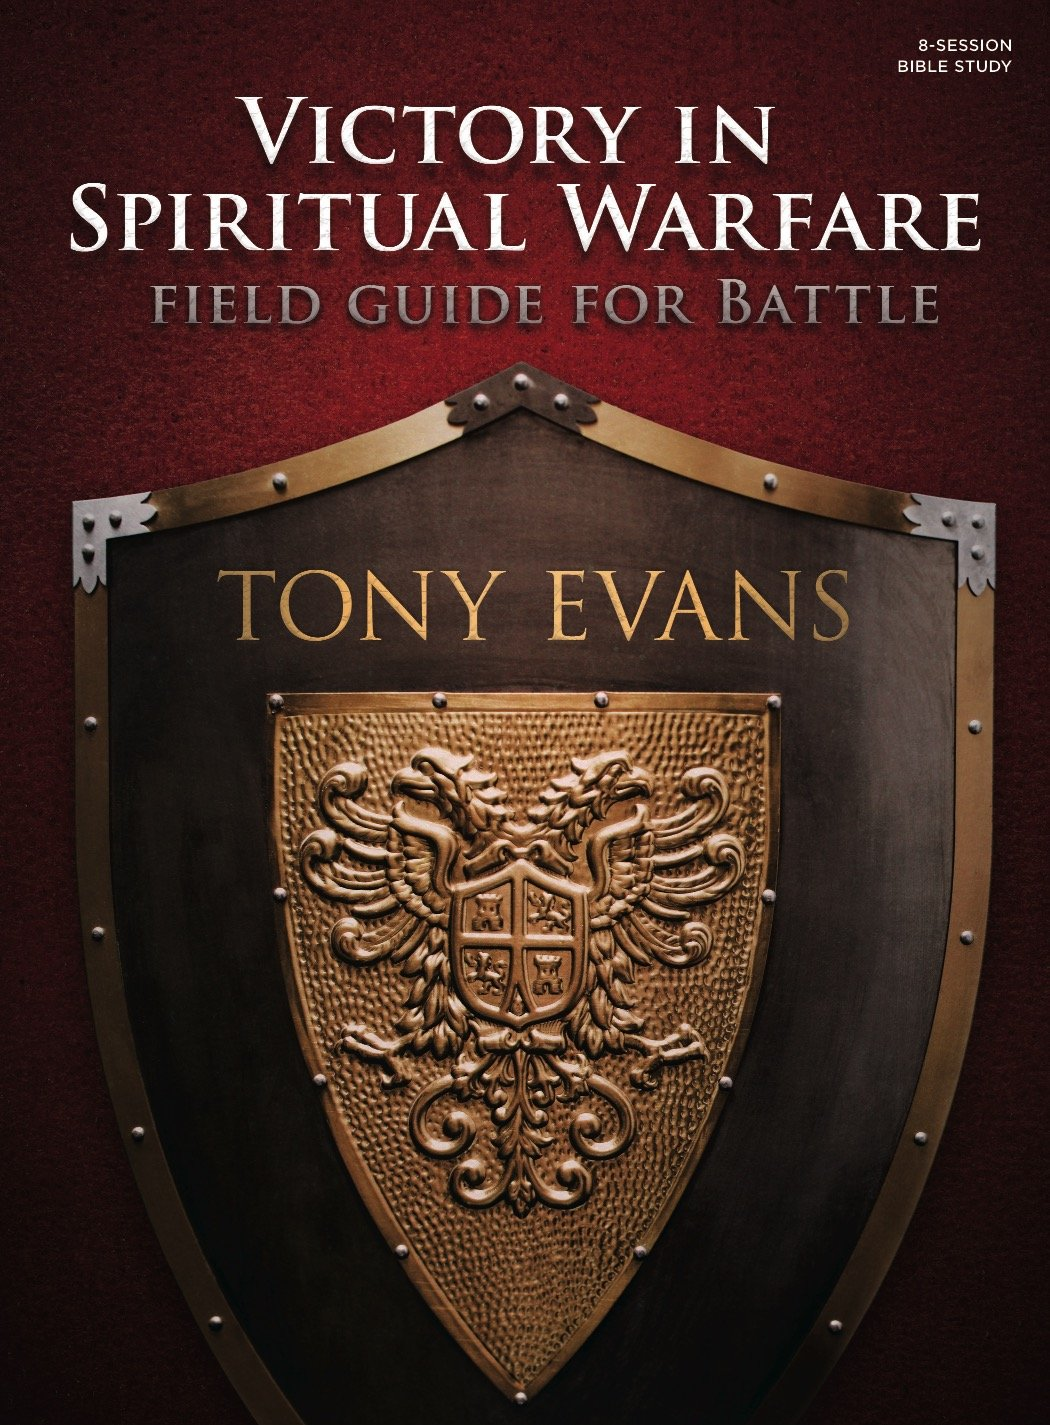 Victory in Spiritual Warfare Bible Study Book: Field Guide for